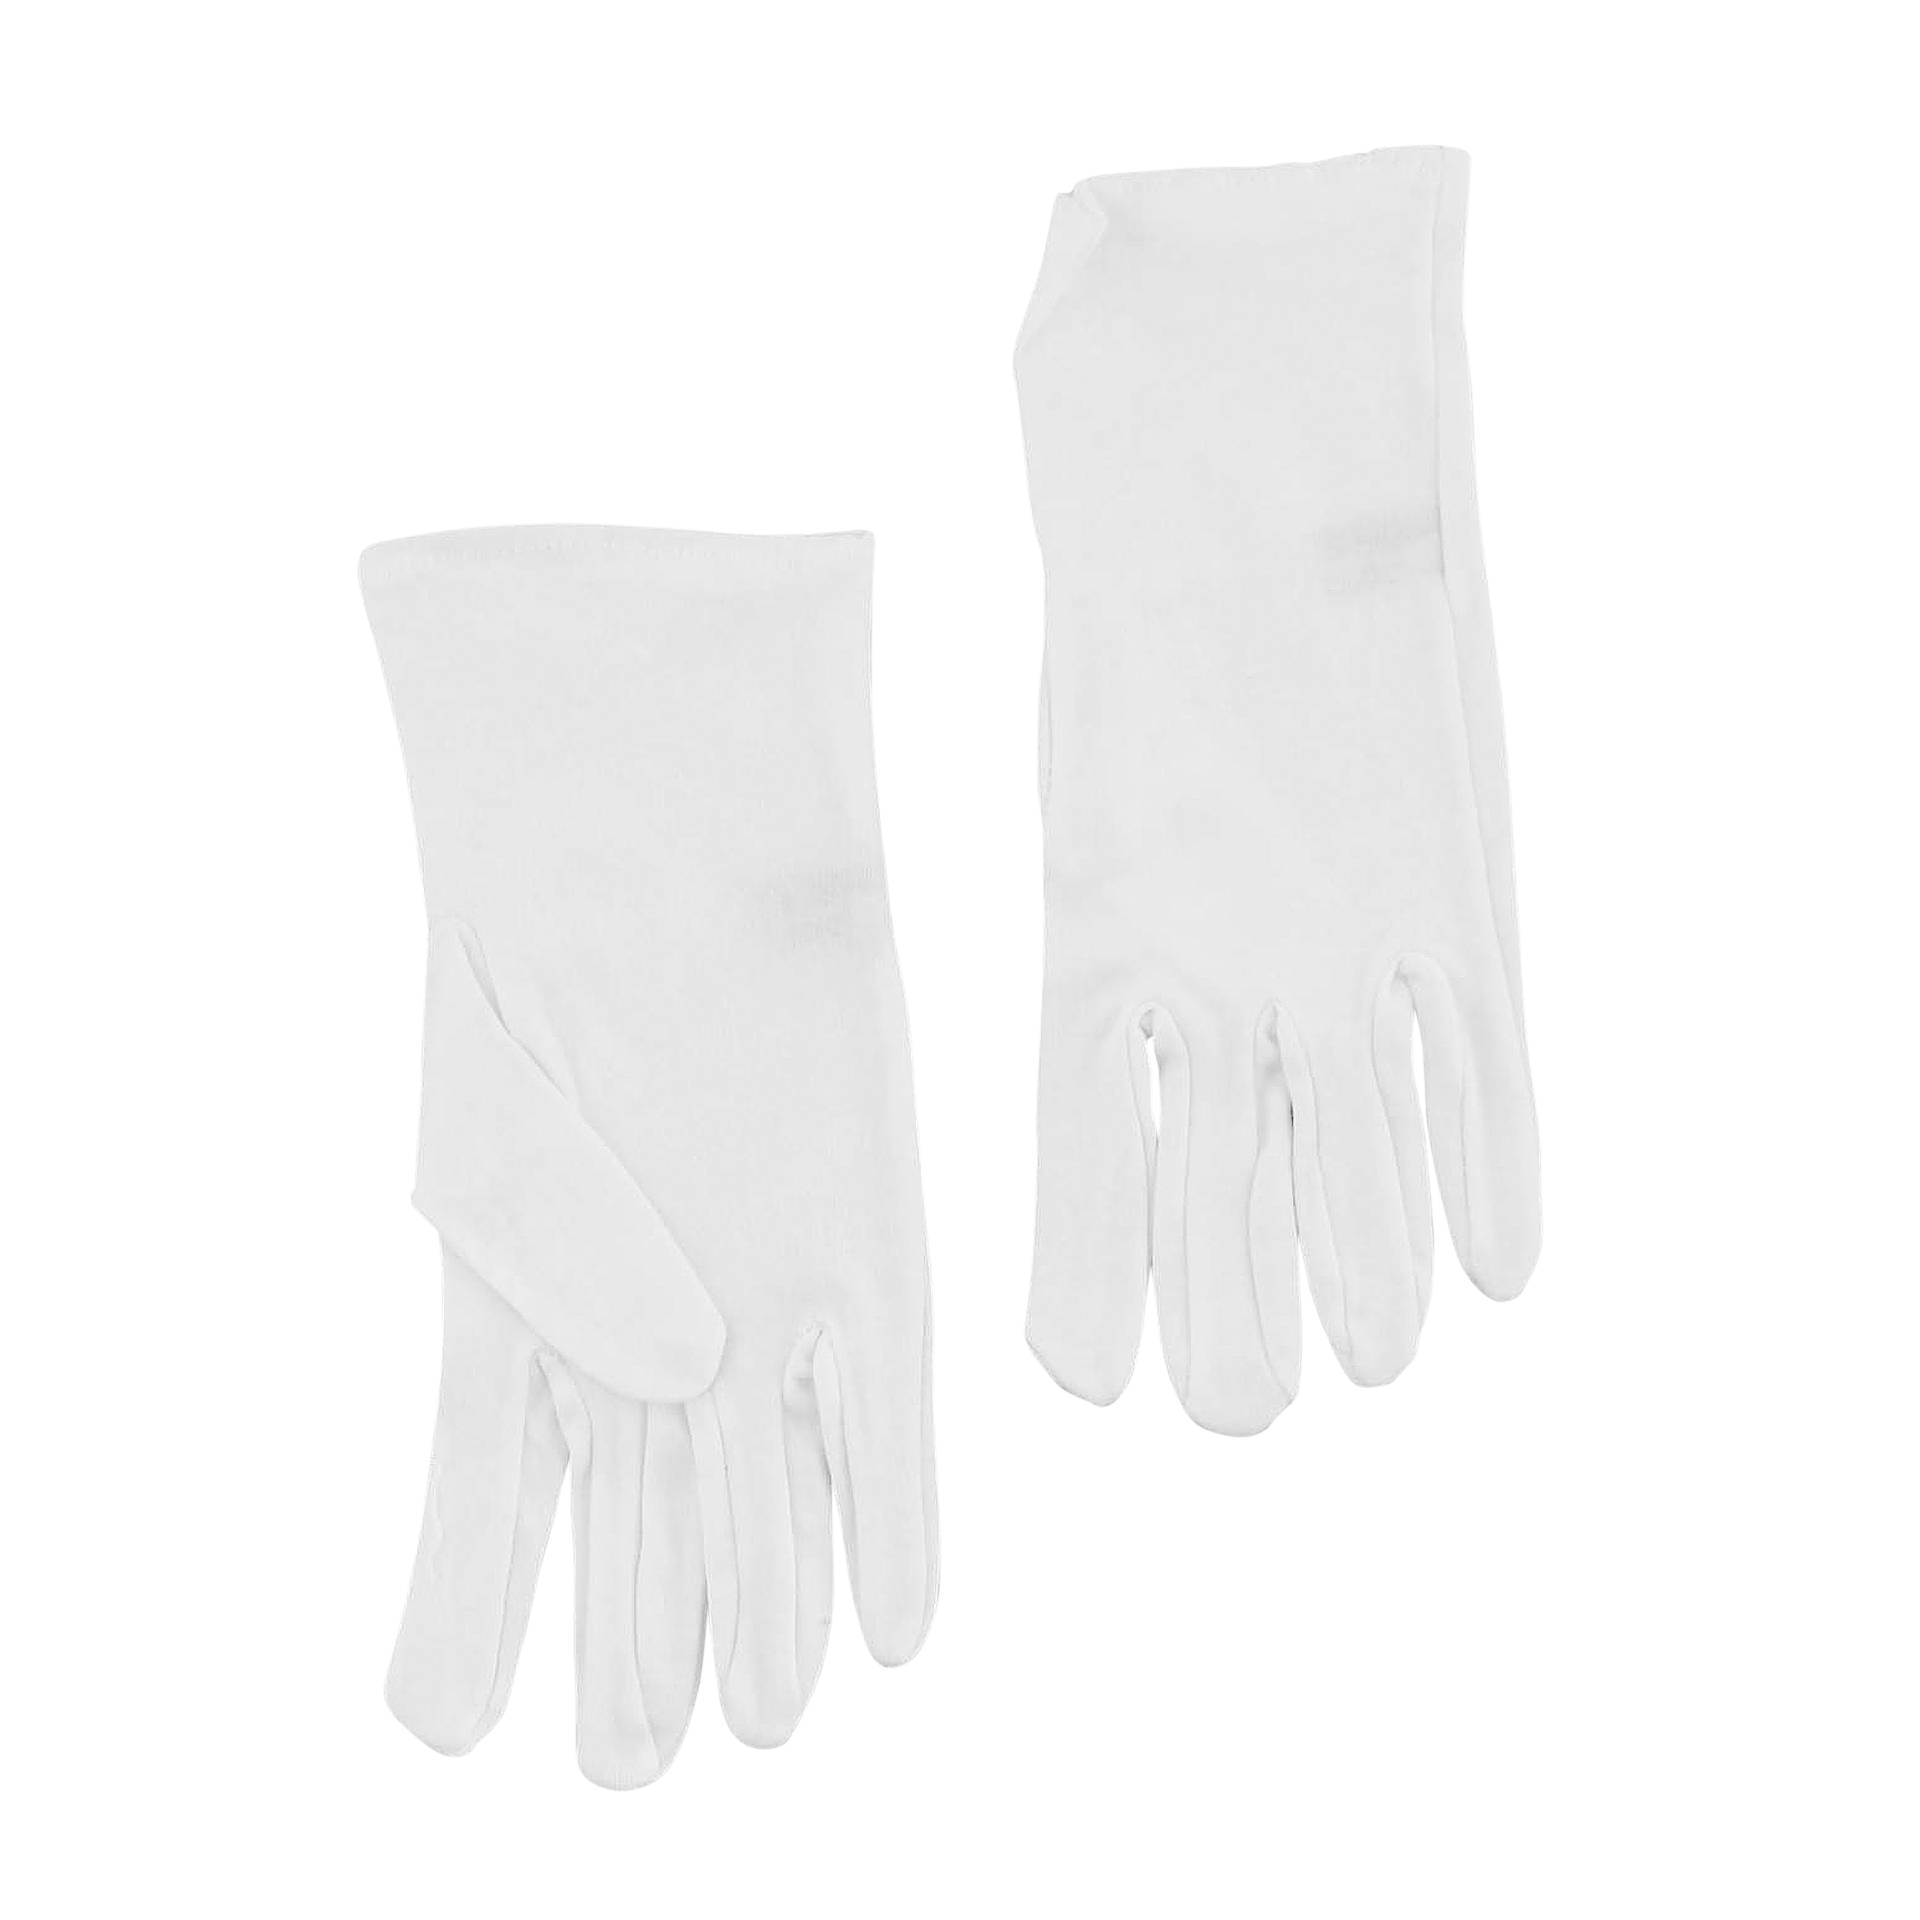 Hama Cotton Gloves Size L